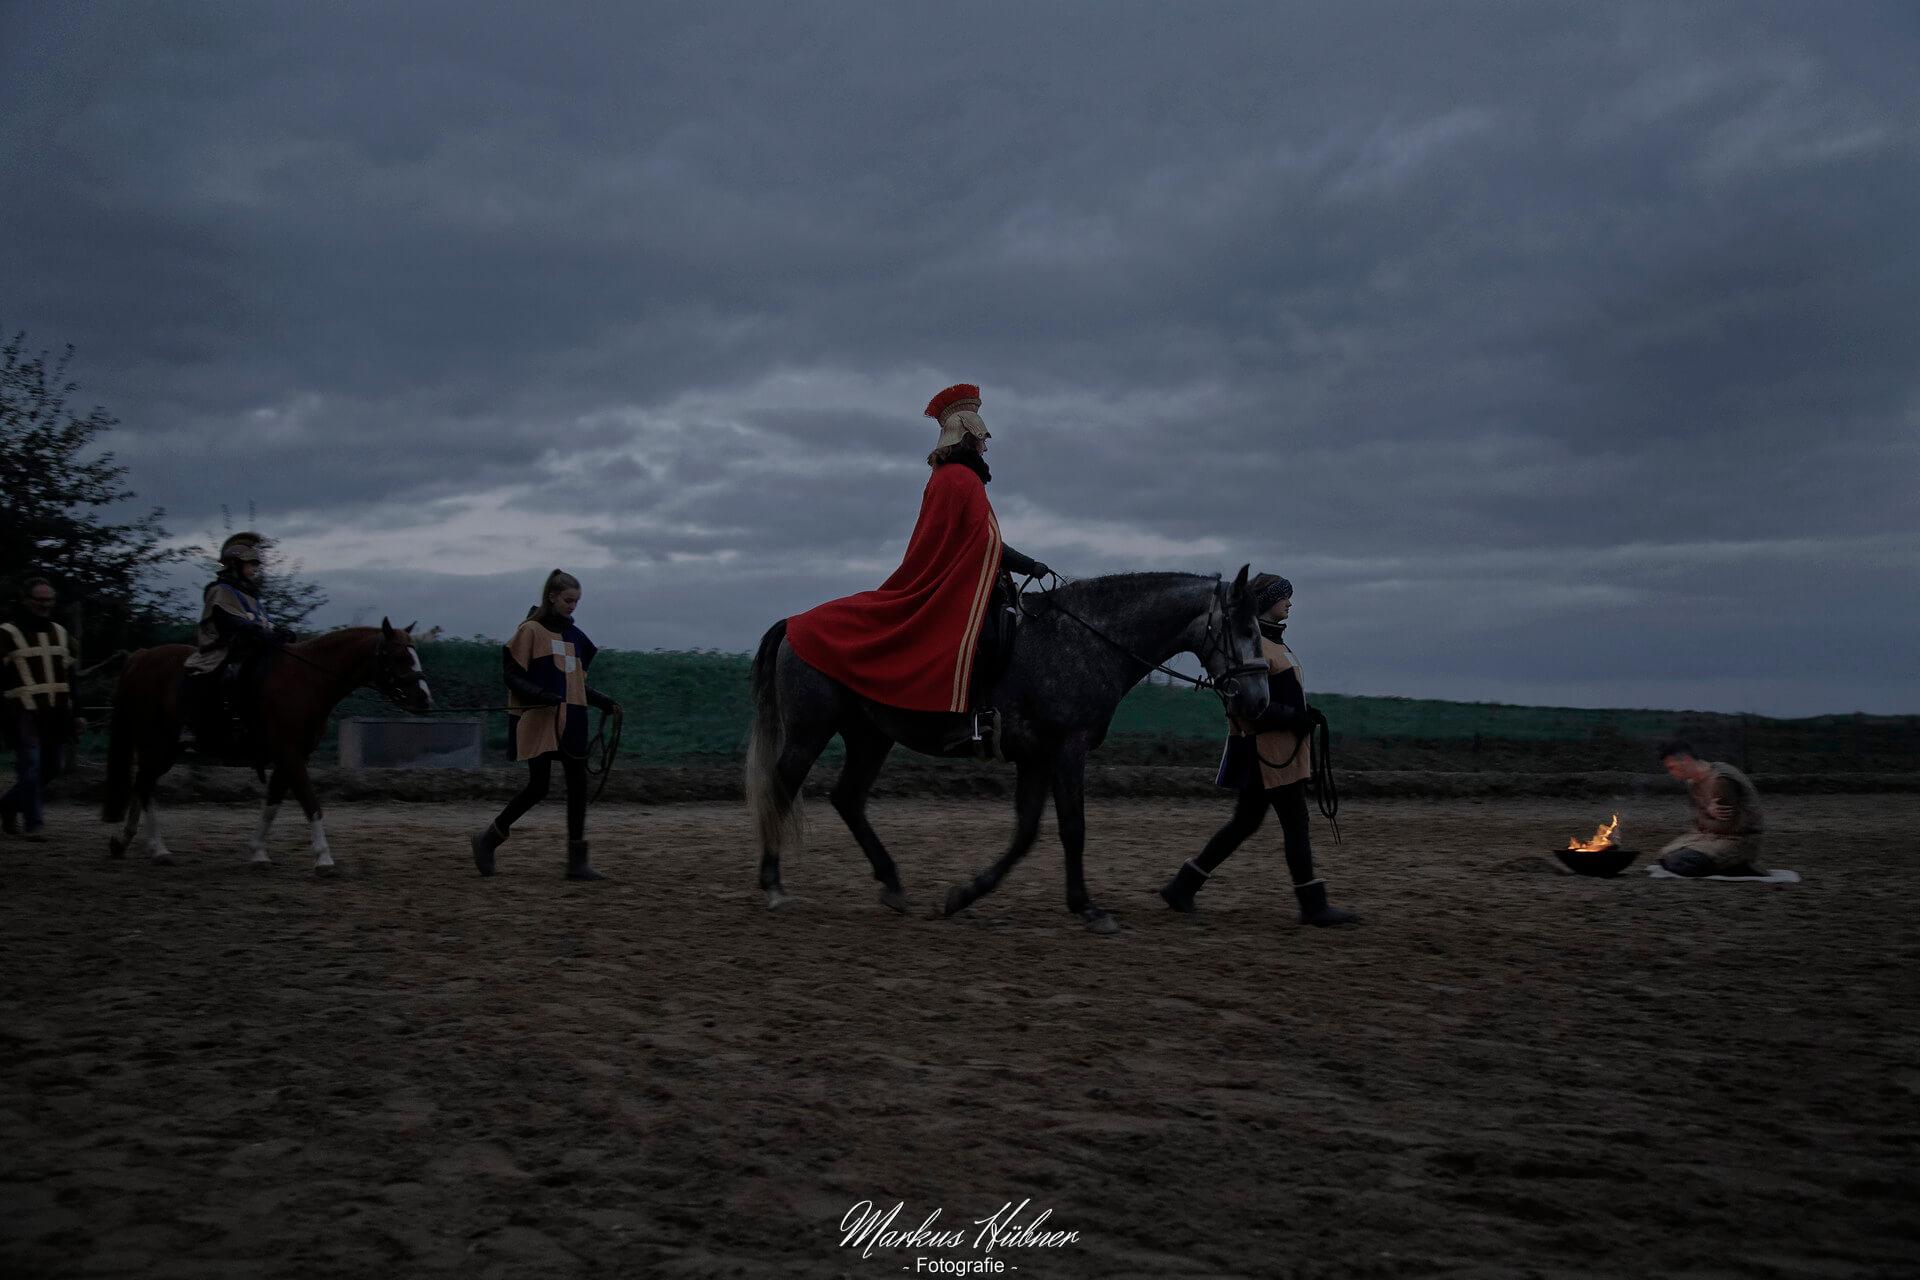 Sankt Martin reitet zum am Feuer kauernden Bettler